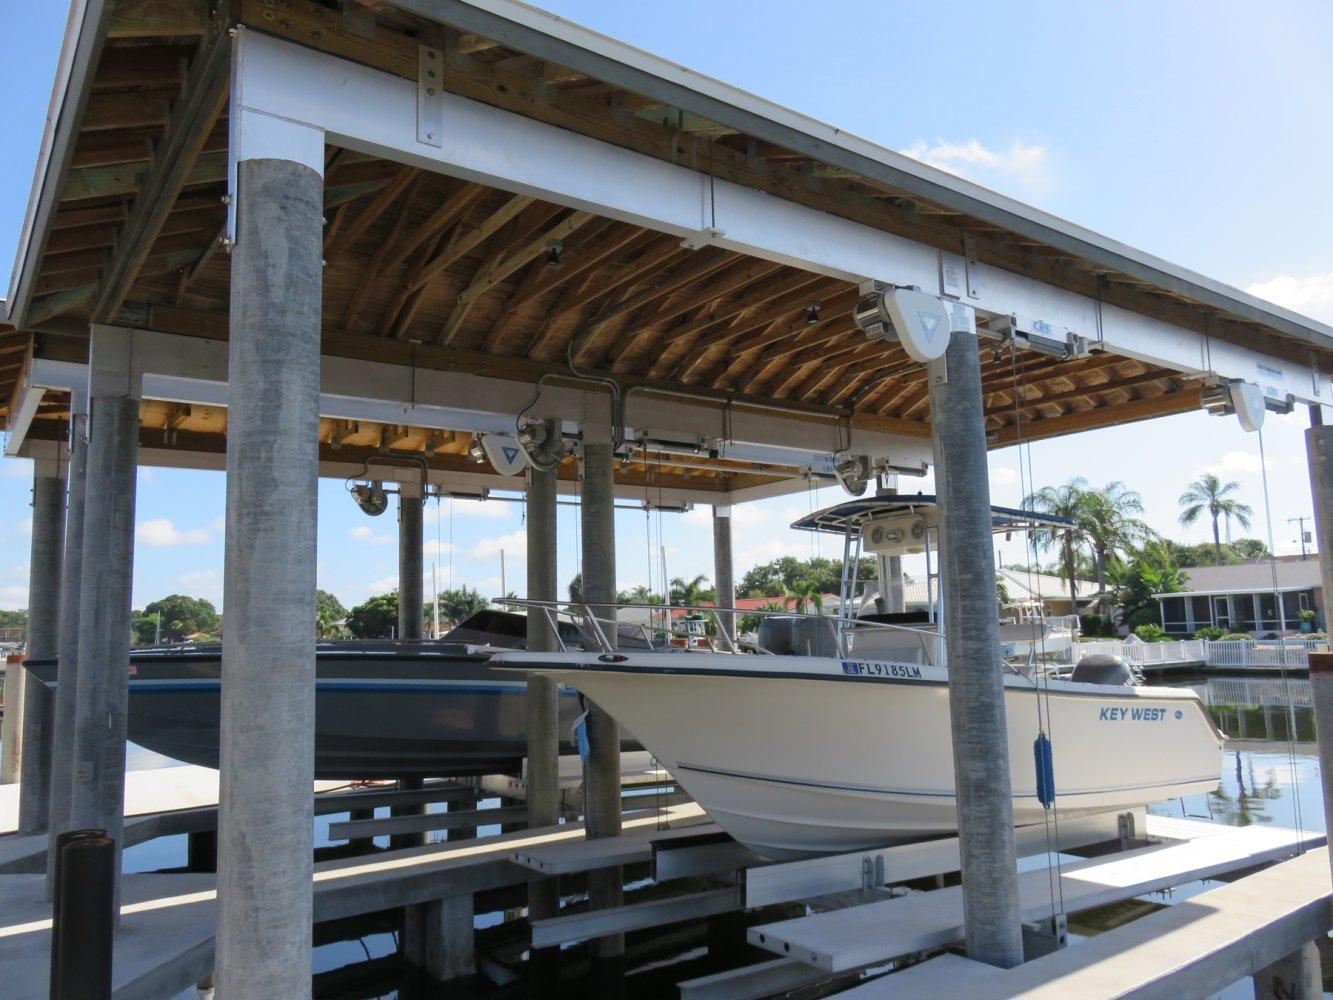 16,000 lb Deco Lift and 13,000 lb Deco Lift with Roof Tabs